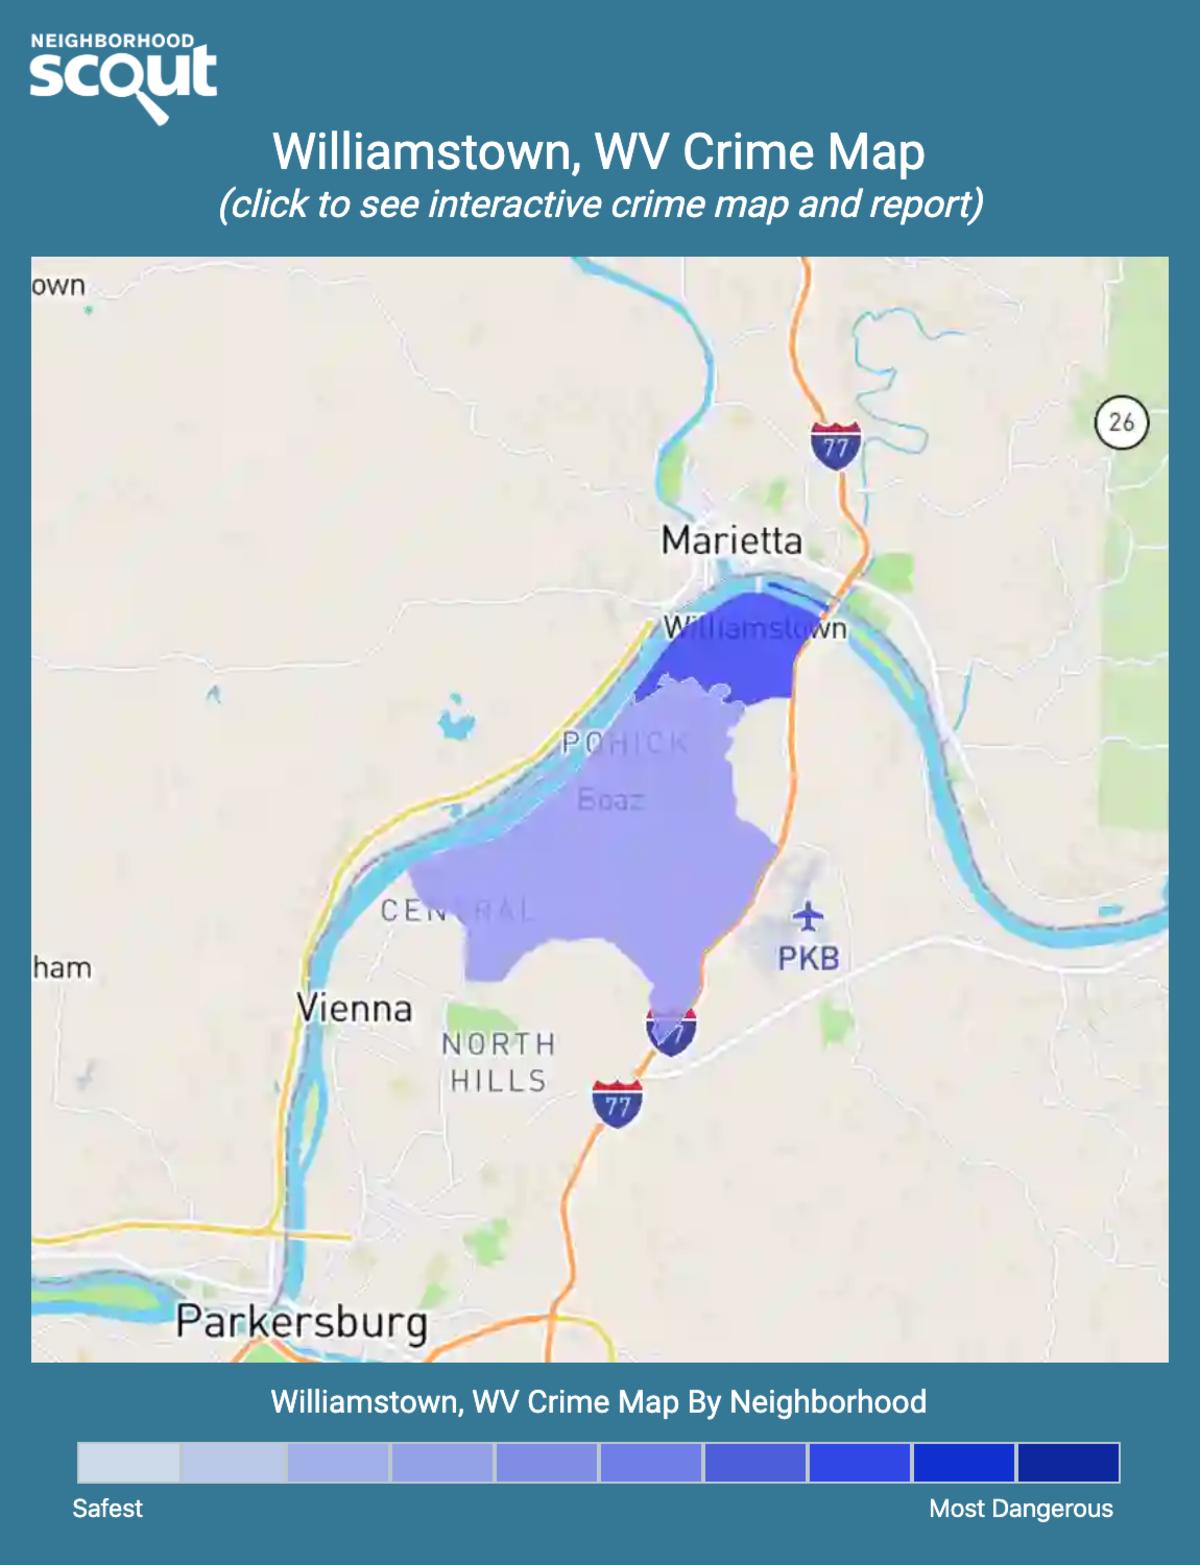 Williamstown, West Virginia crime map